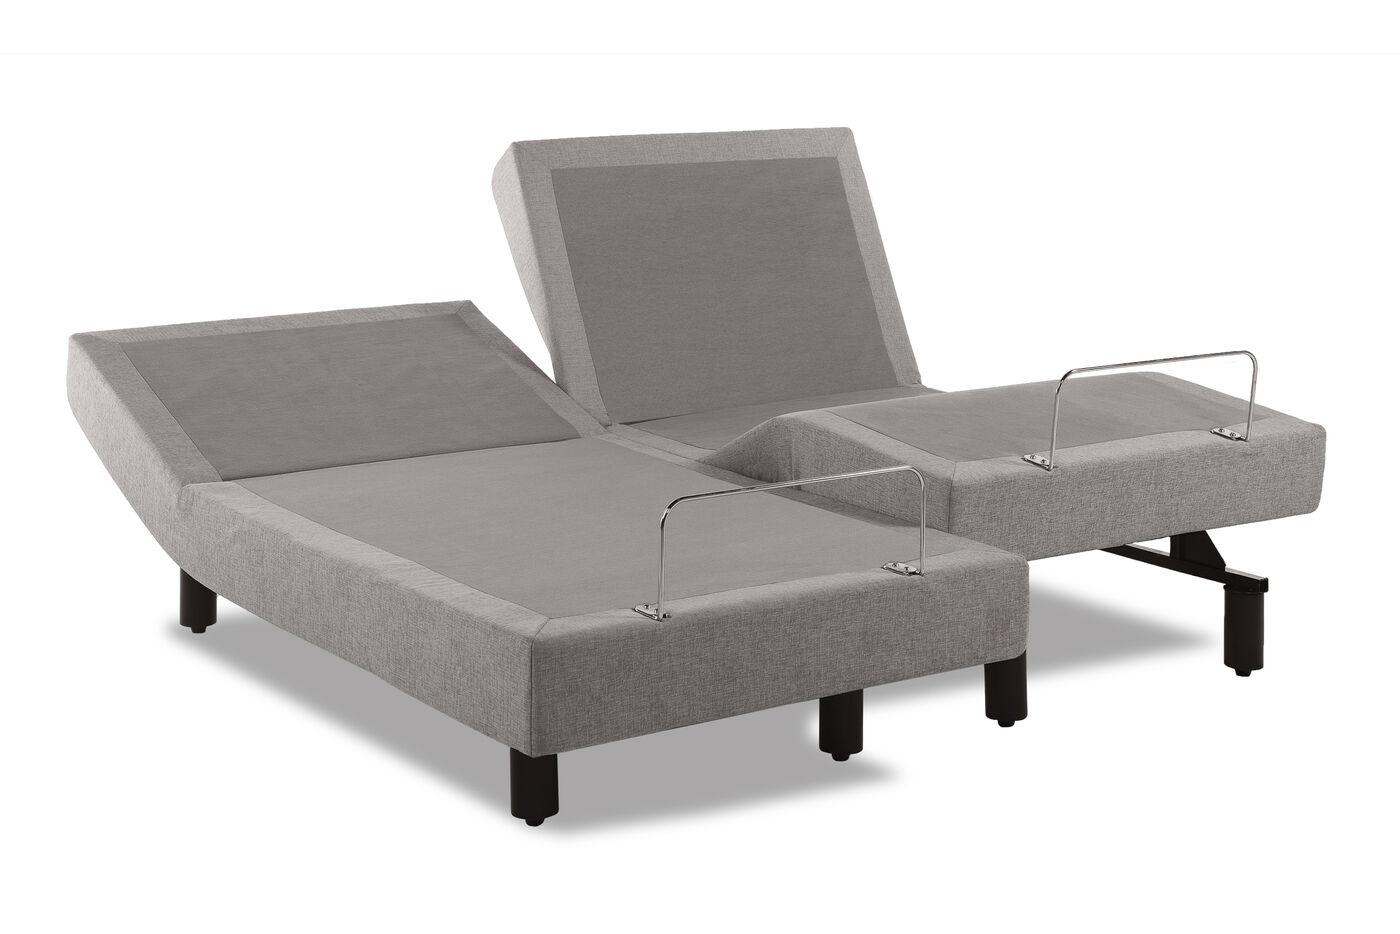 tempur pedic tempur flex elite mattress mathis brothers furniture